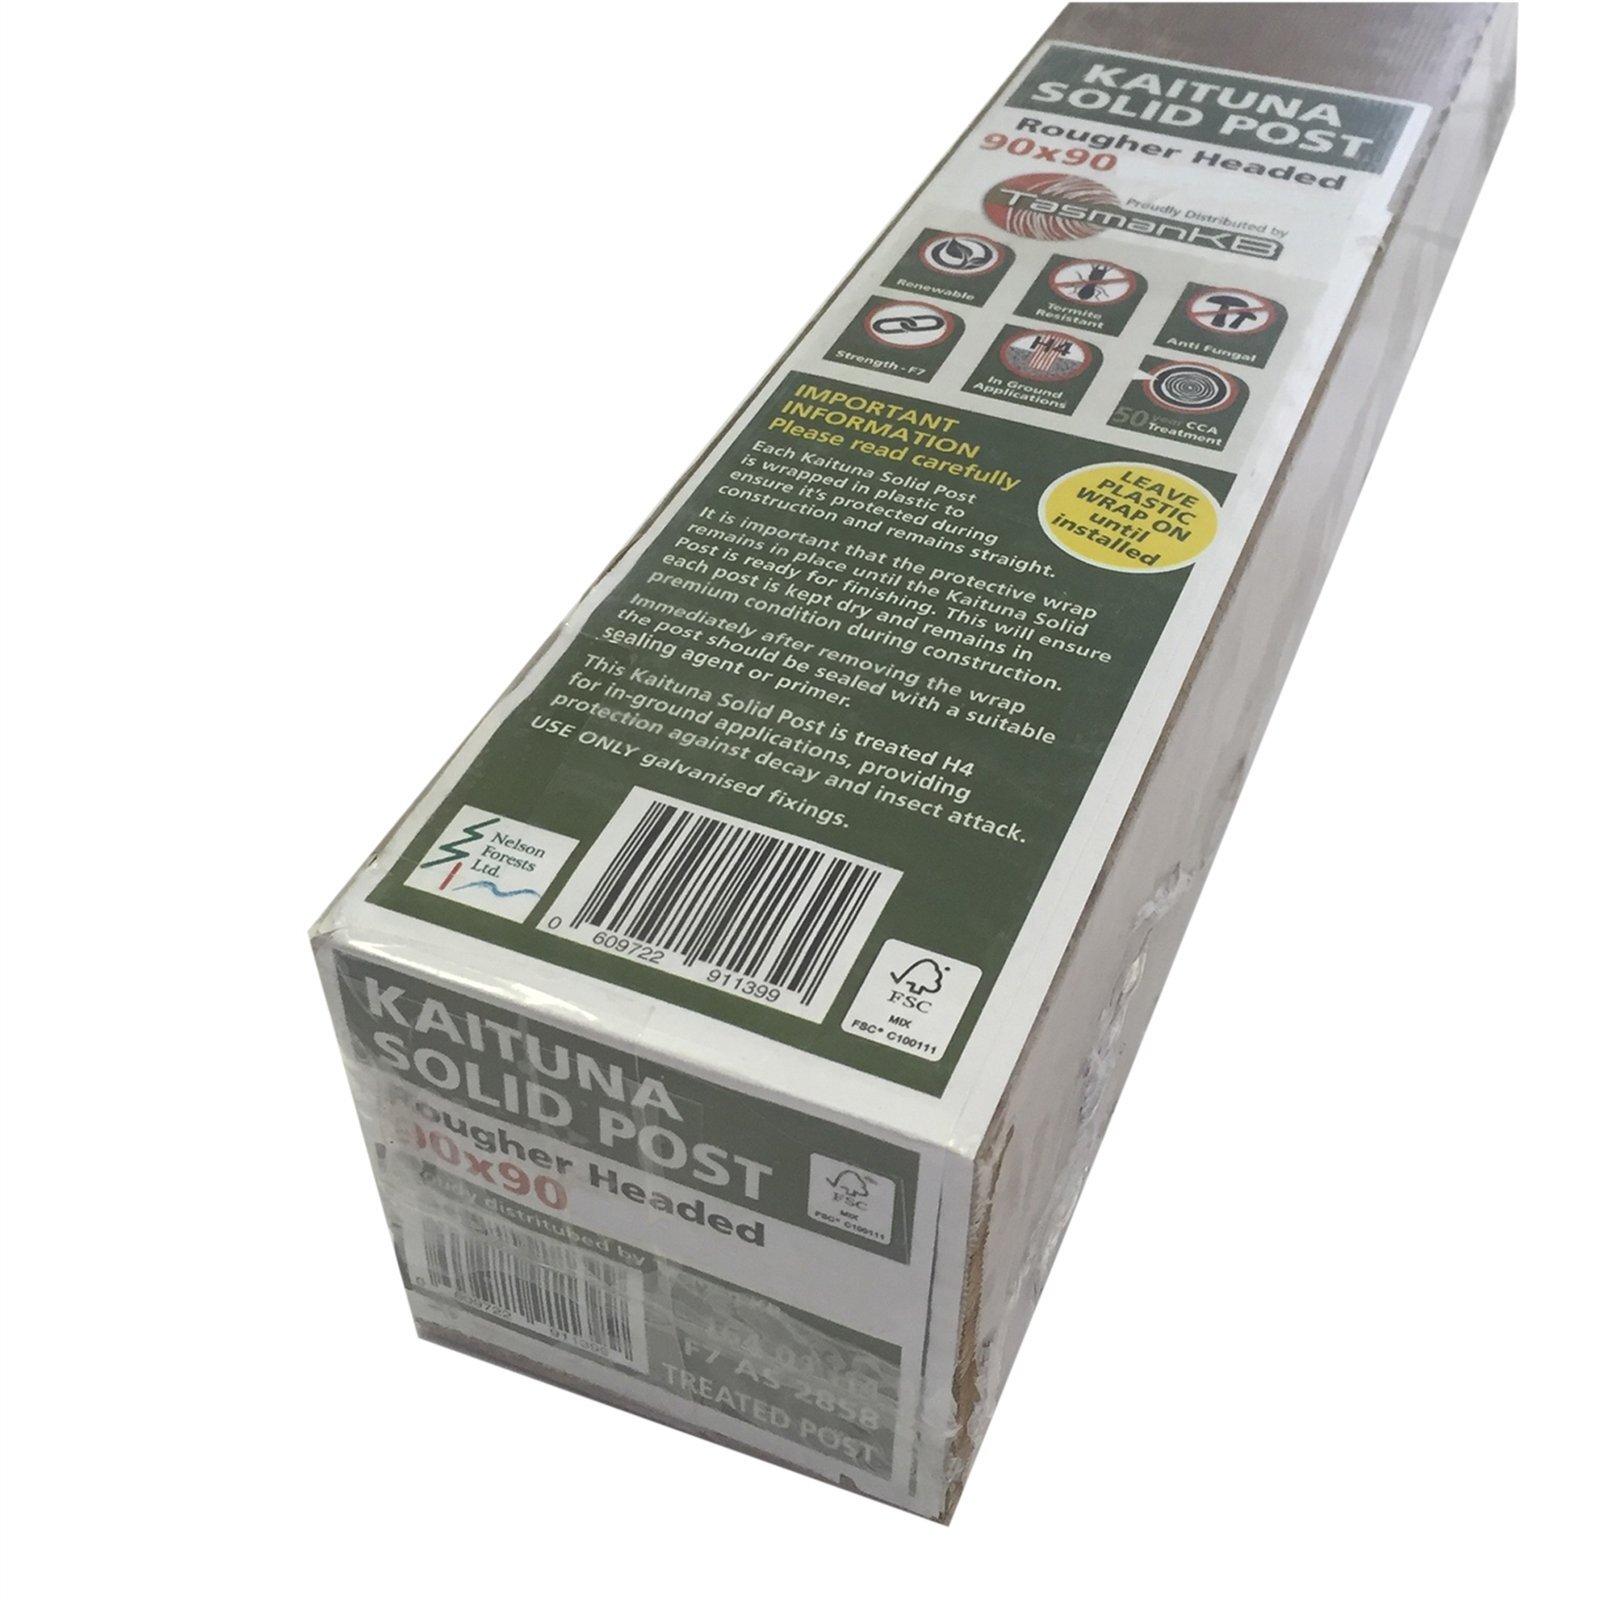 90 x 90mm 5.4m F7 KD H4 RH Premium Wrapped Treated Pine